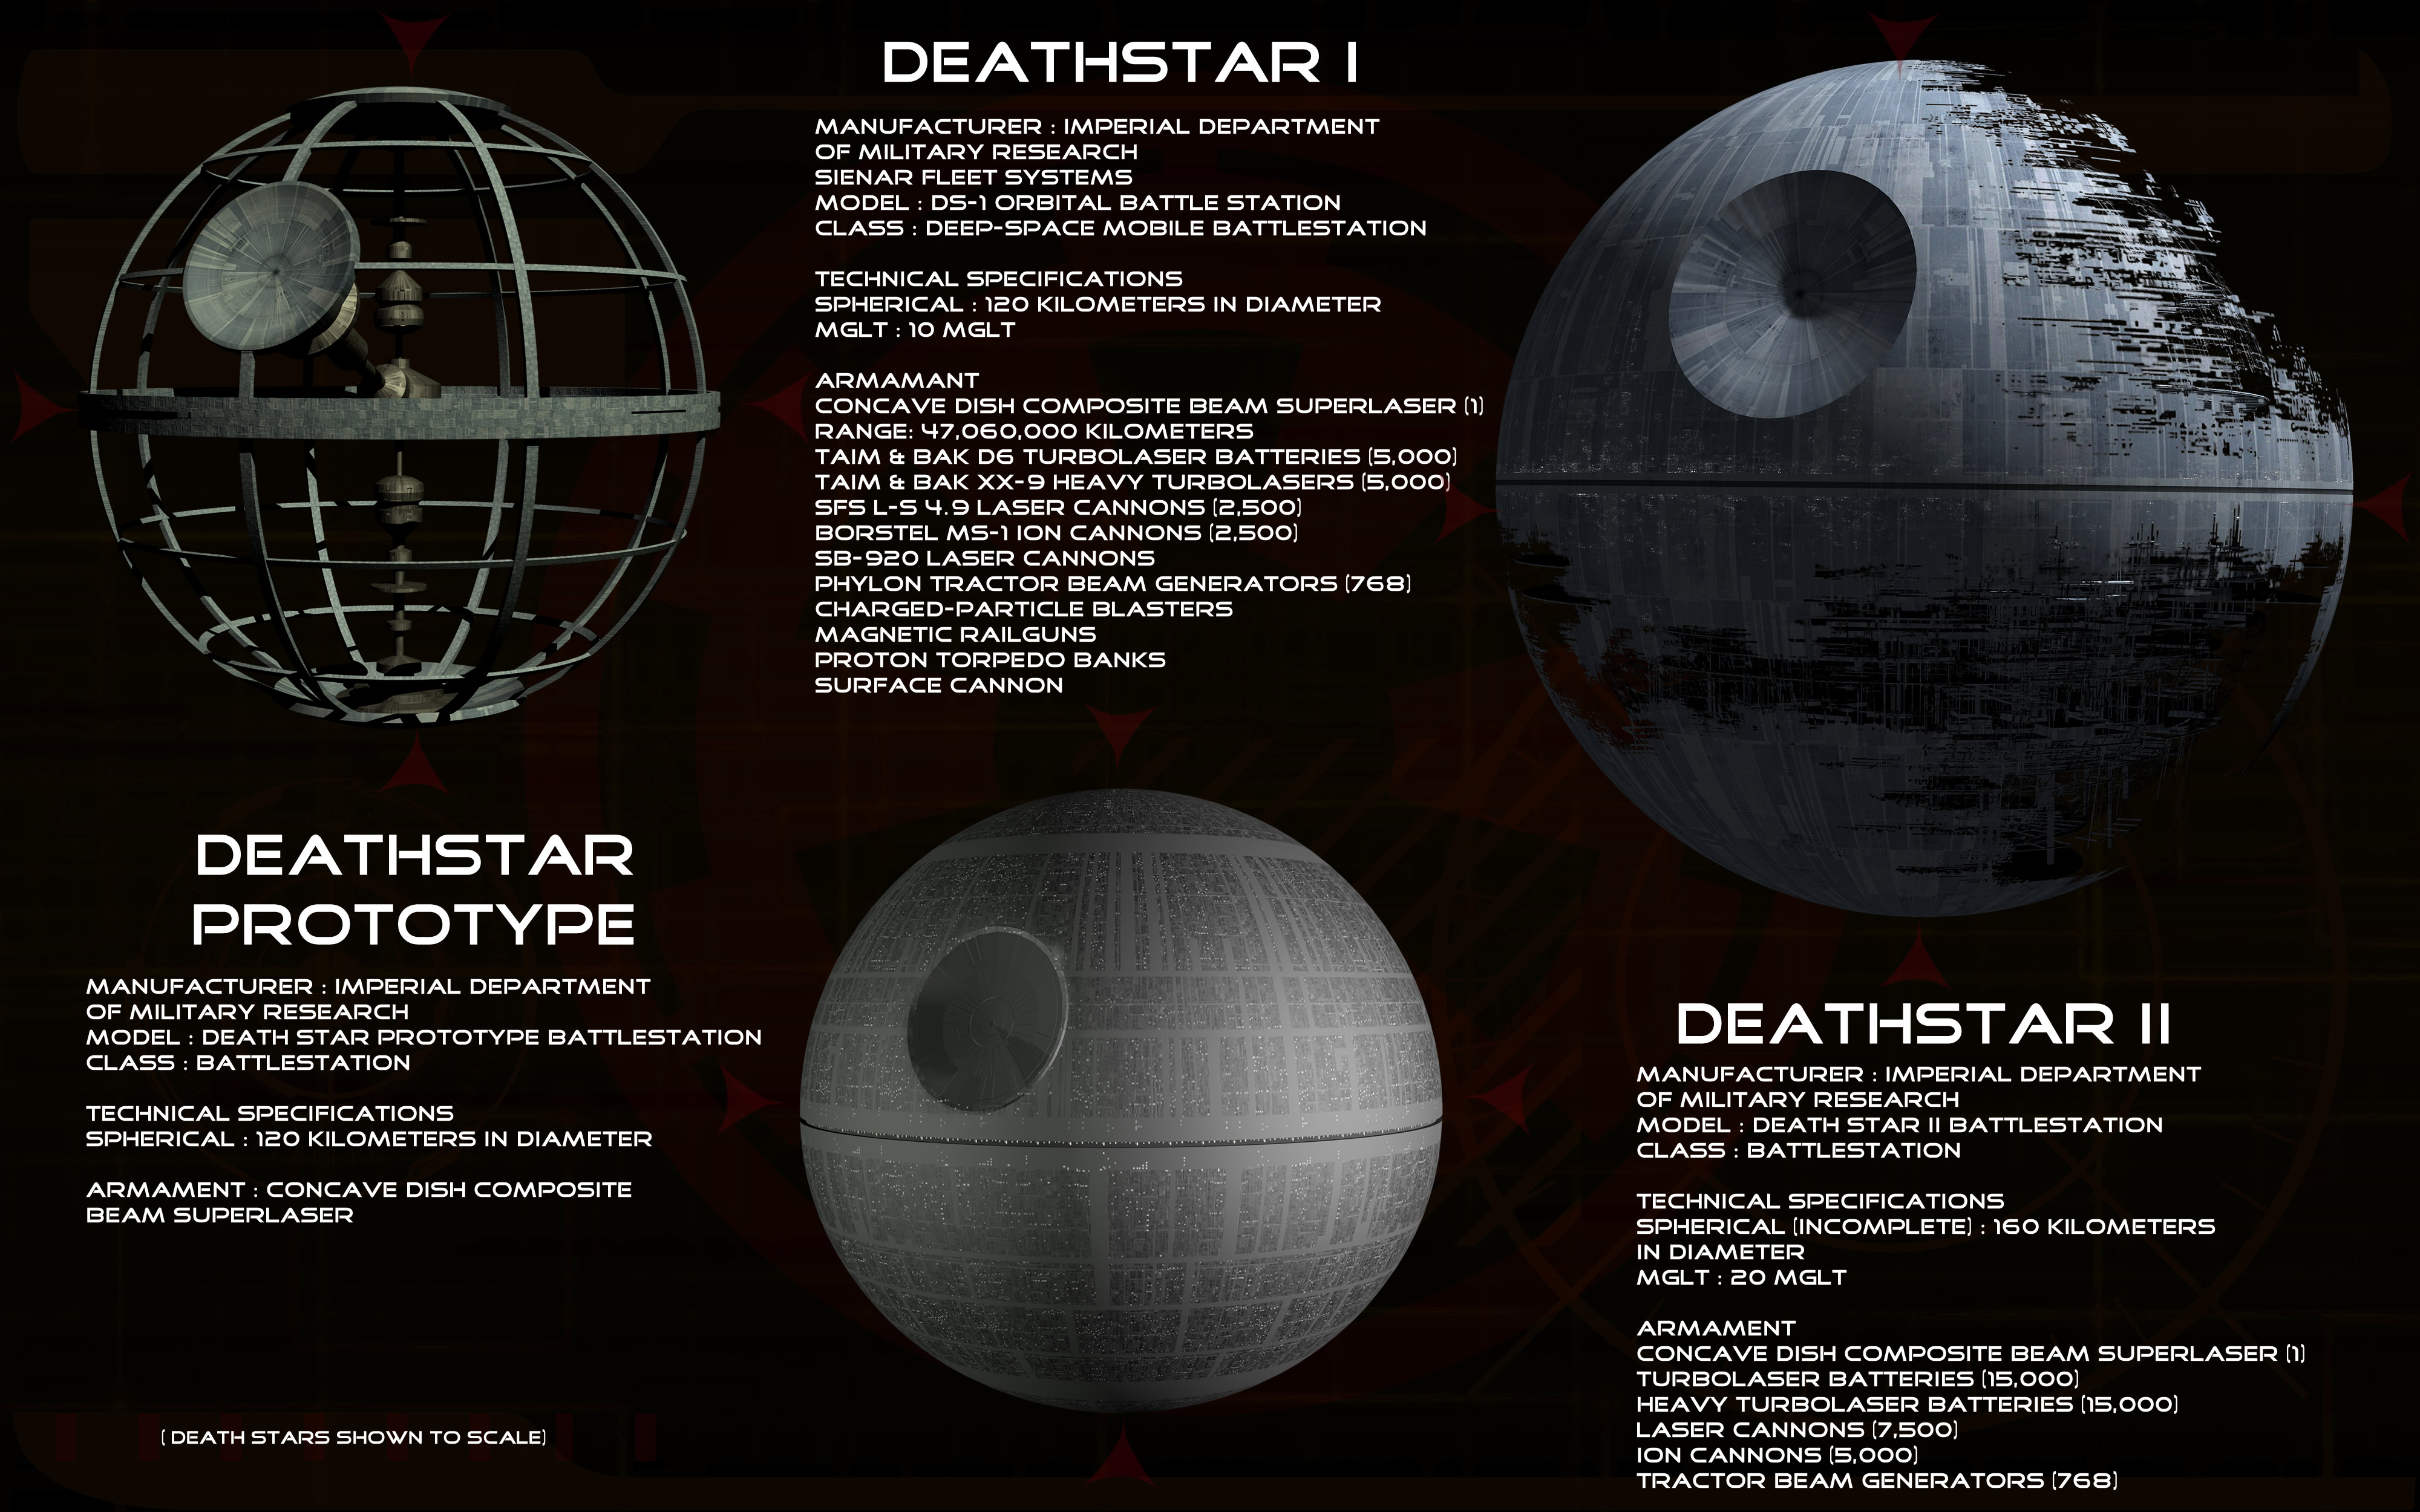 [49+] Death Star Wallpapers 1200x800 on WallpaperSafari